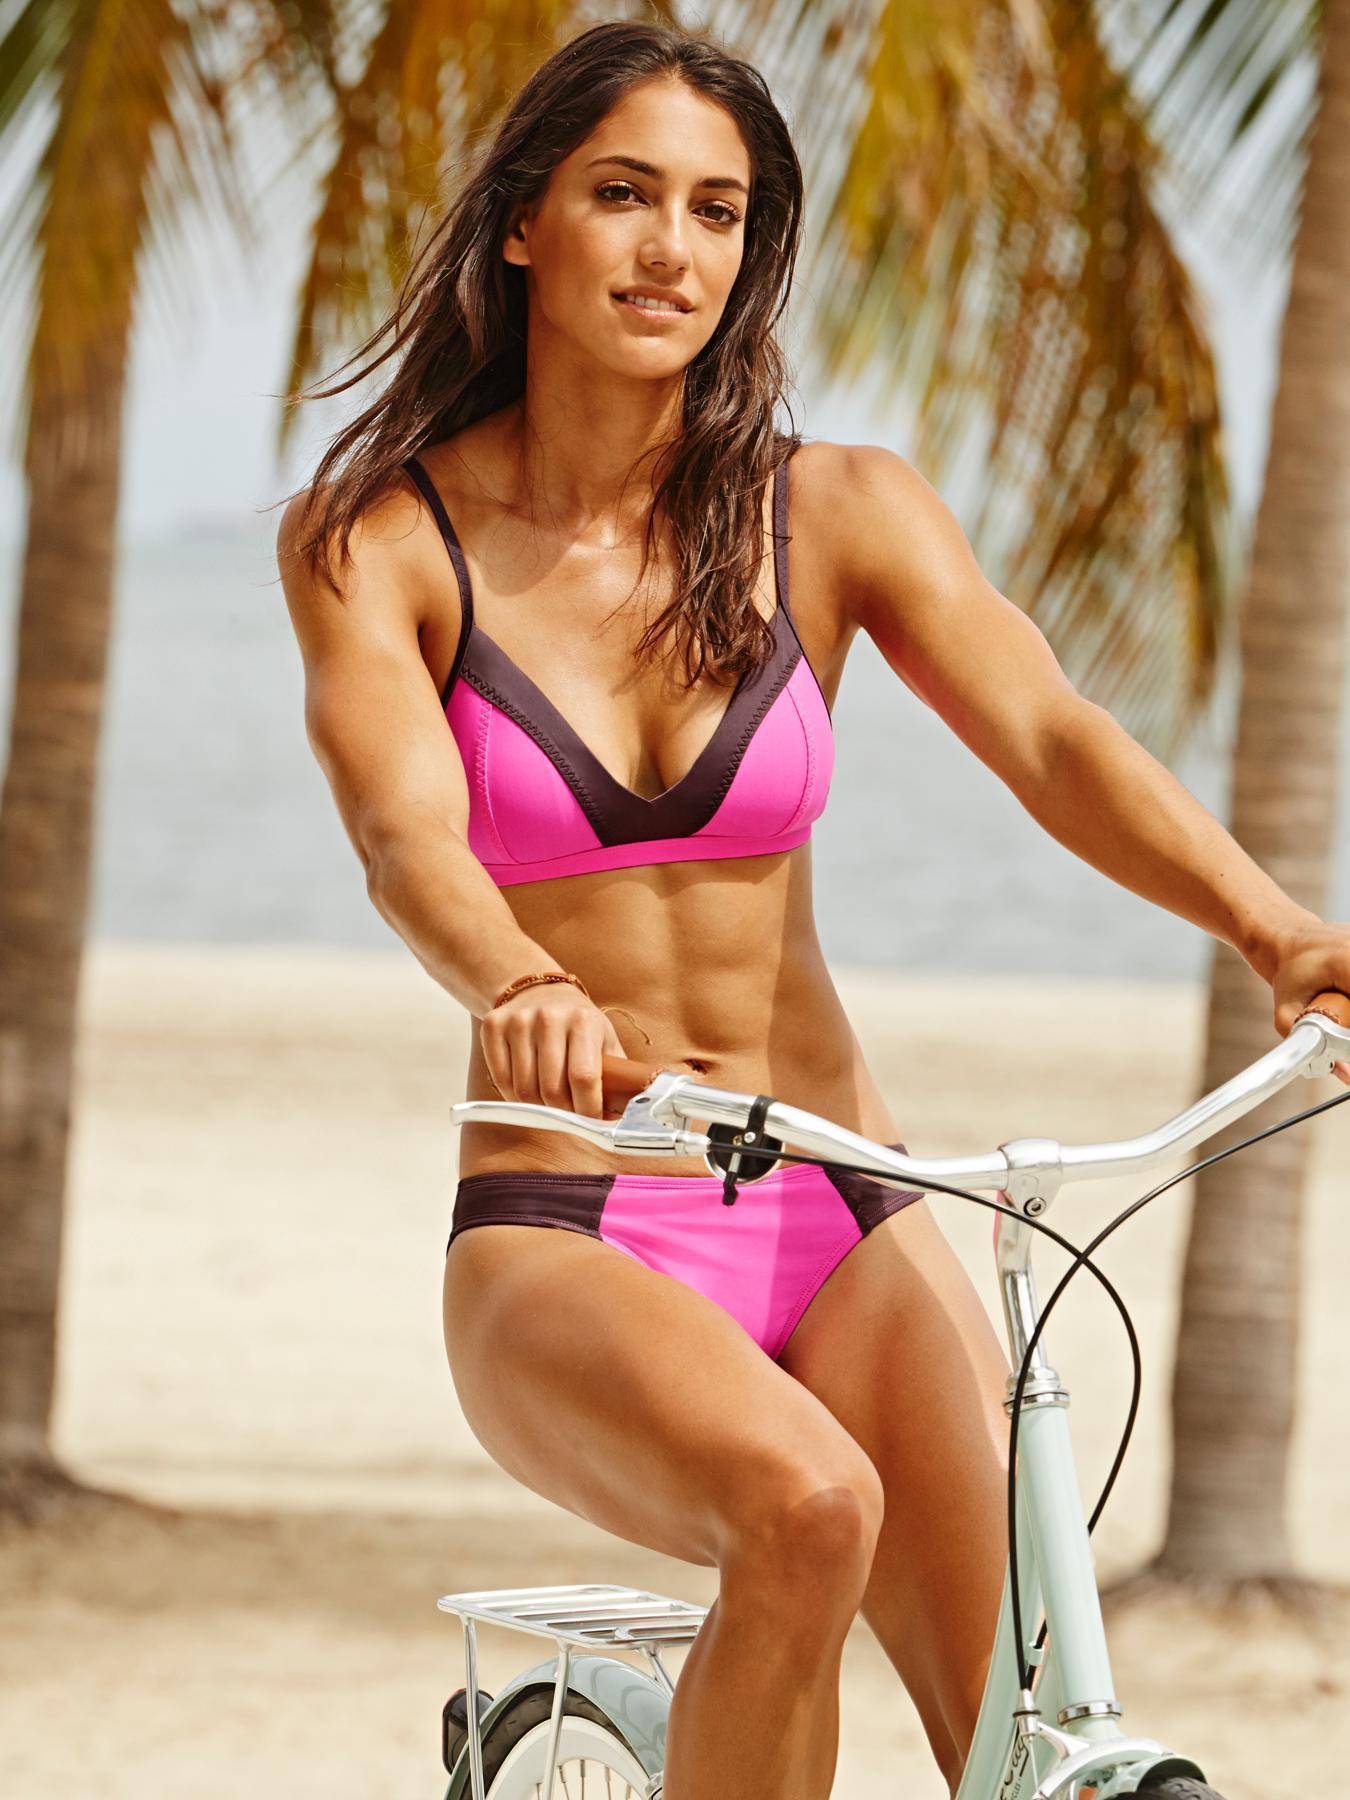 Allison Stokke hot bikini pics